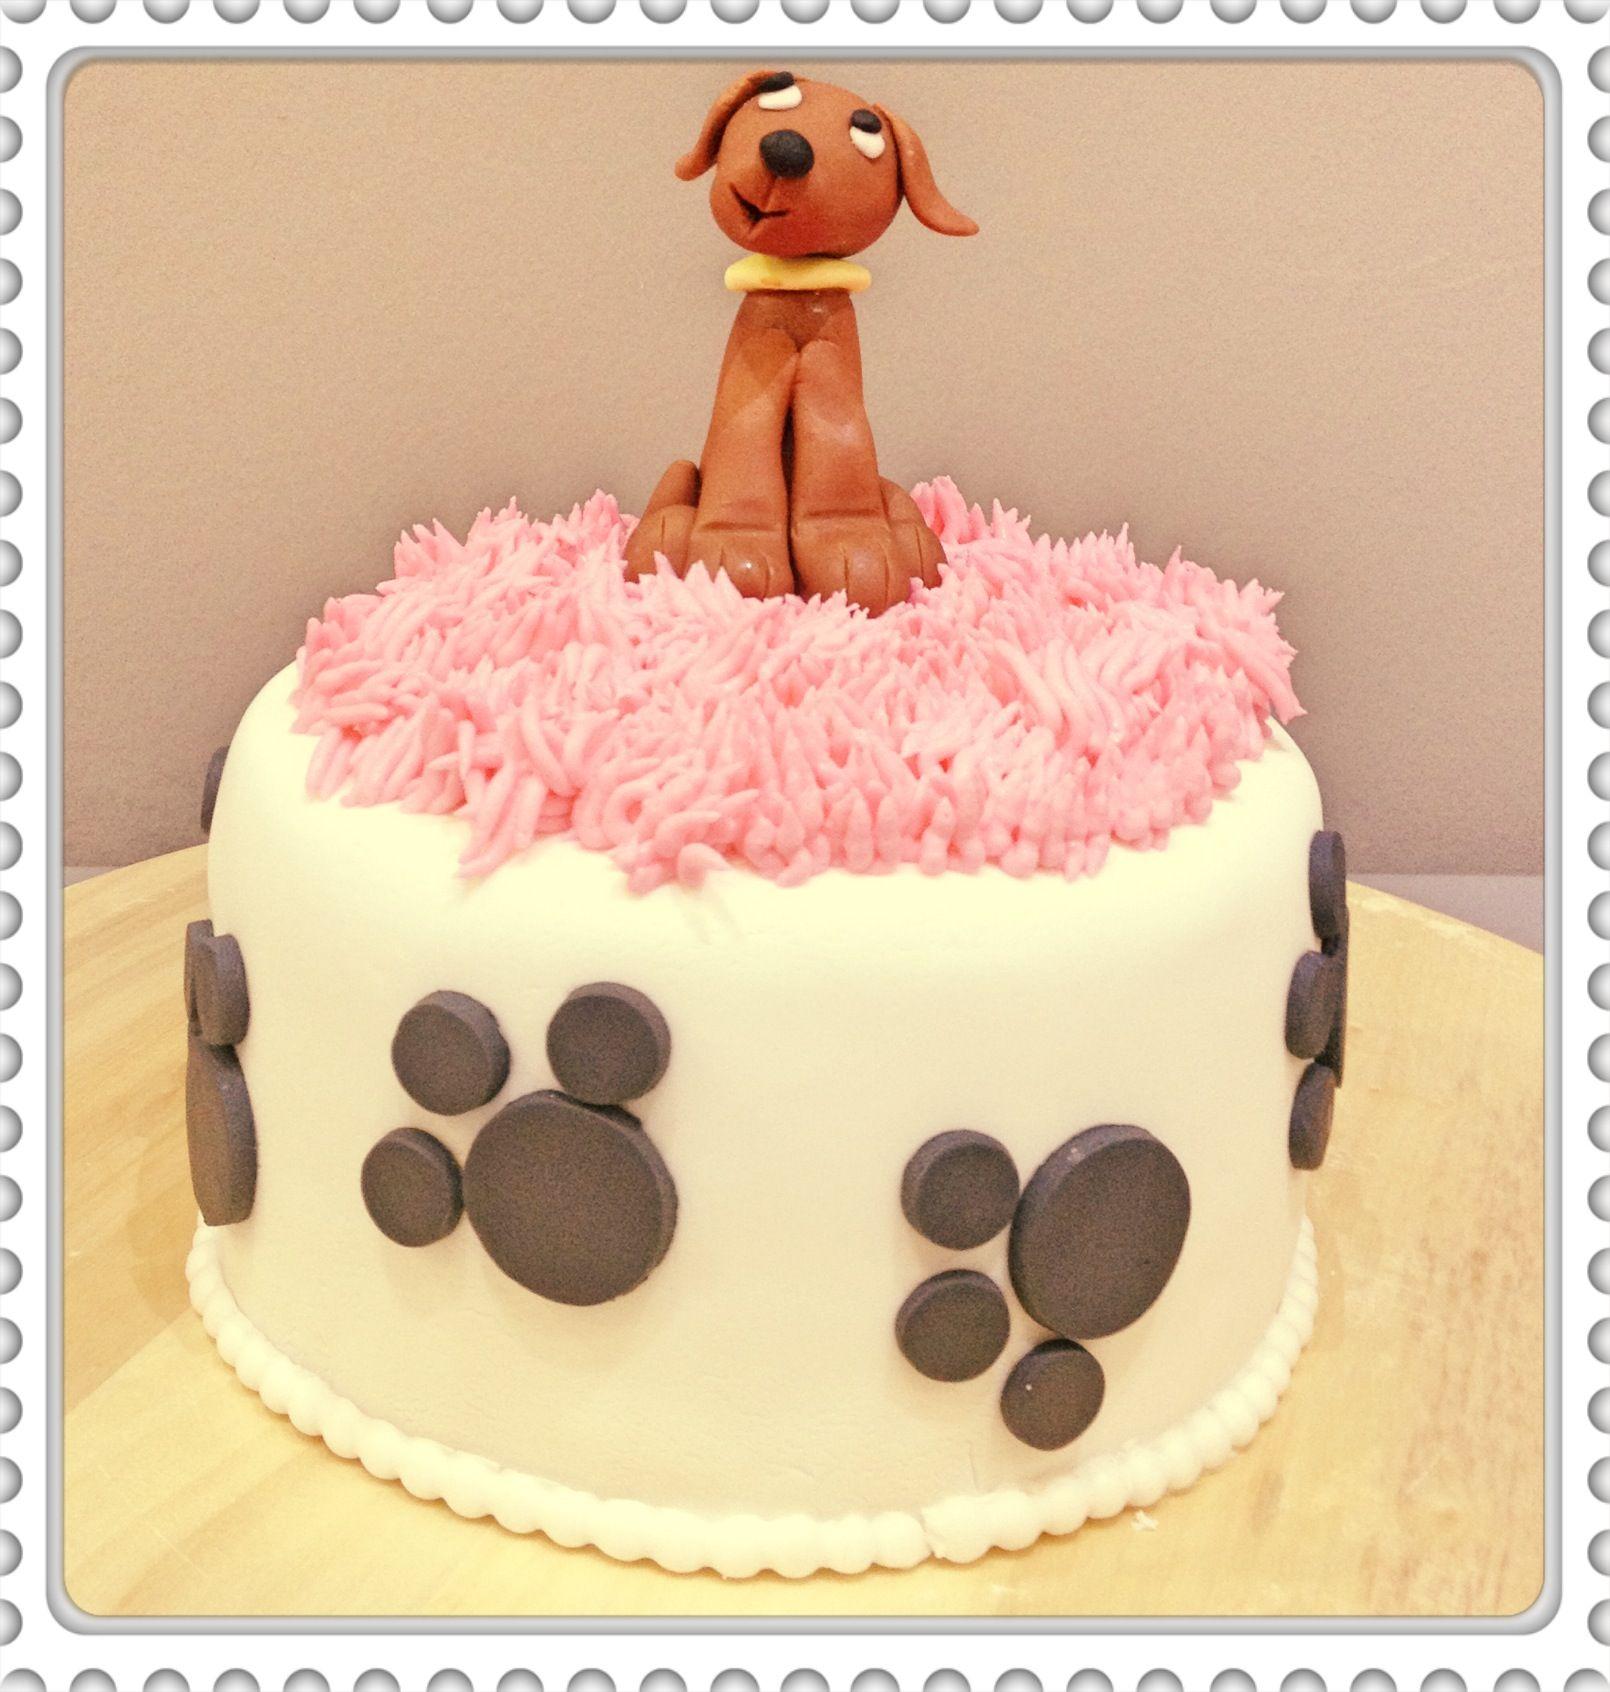 Pastel con un perrito modelado!  #bautizo #sibarum #sitges #cake #dogscake